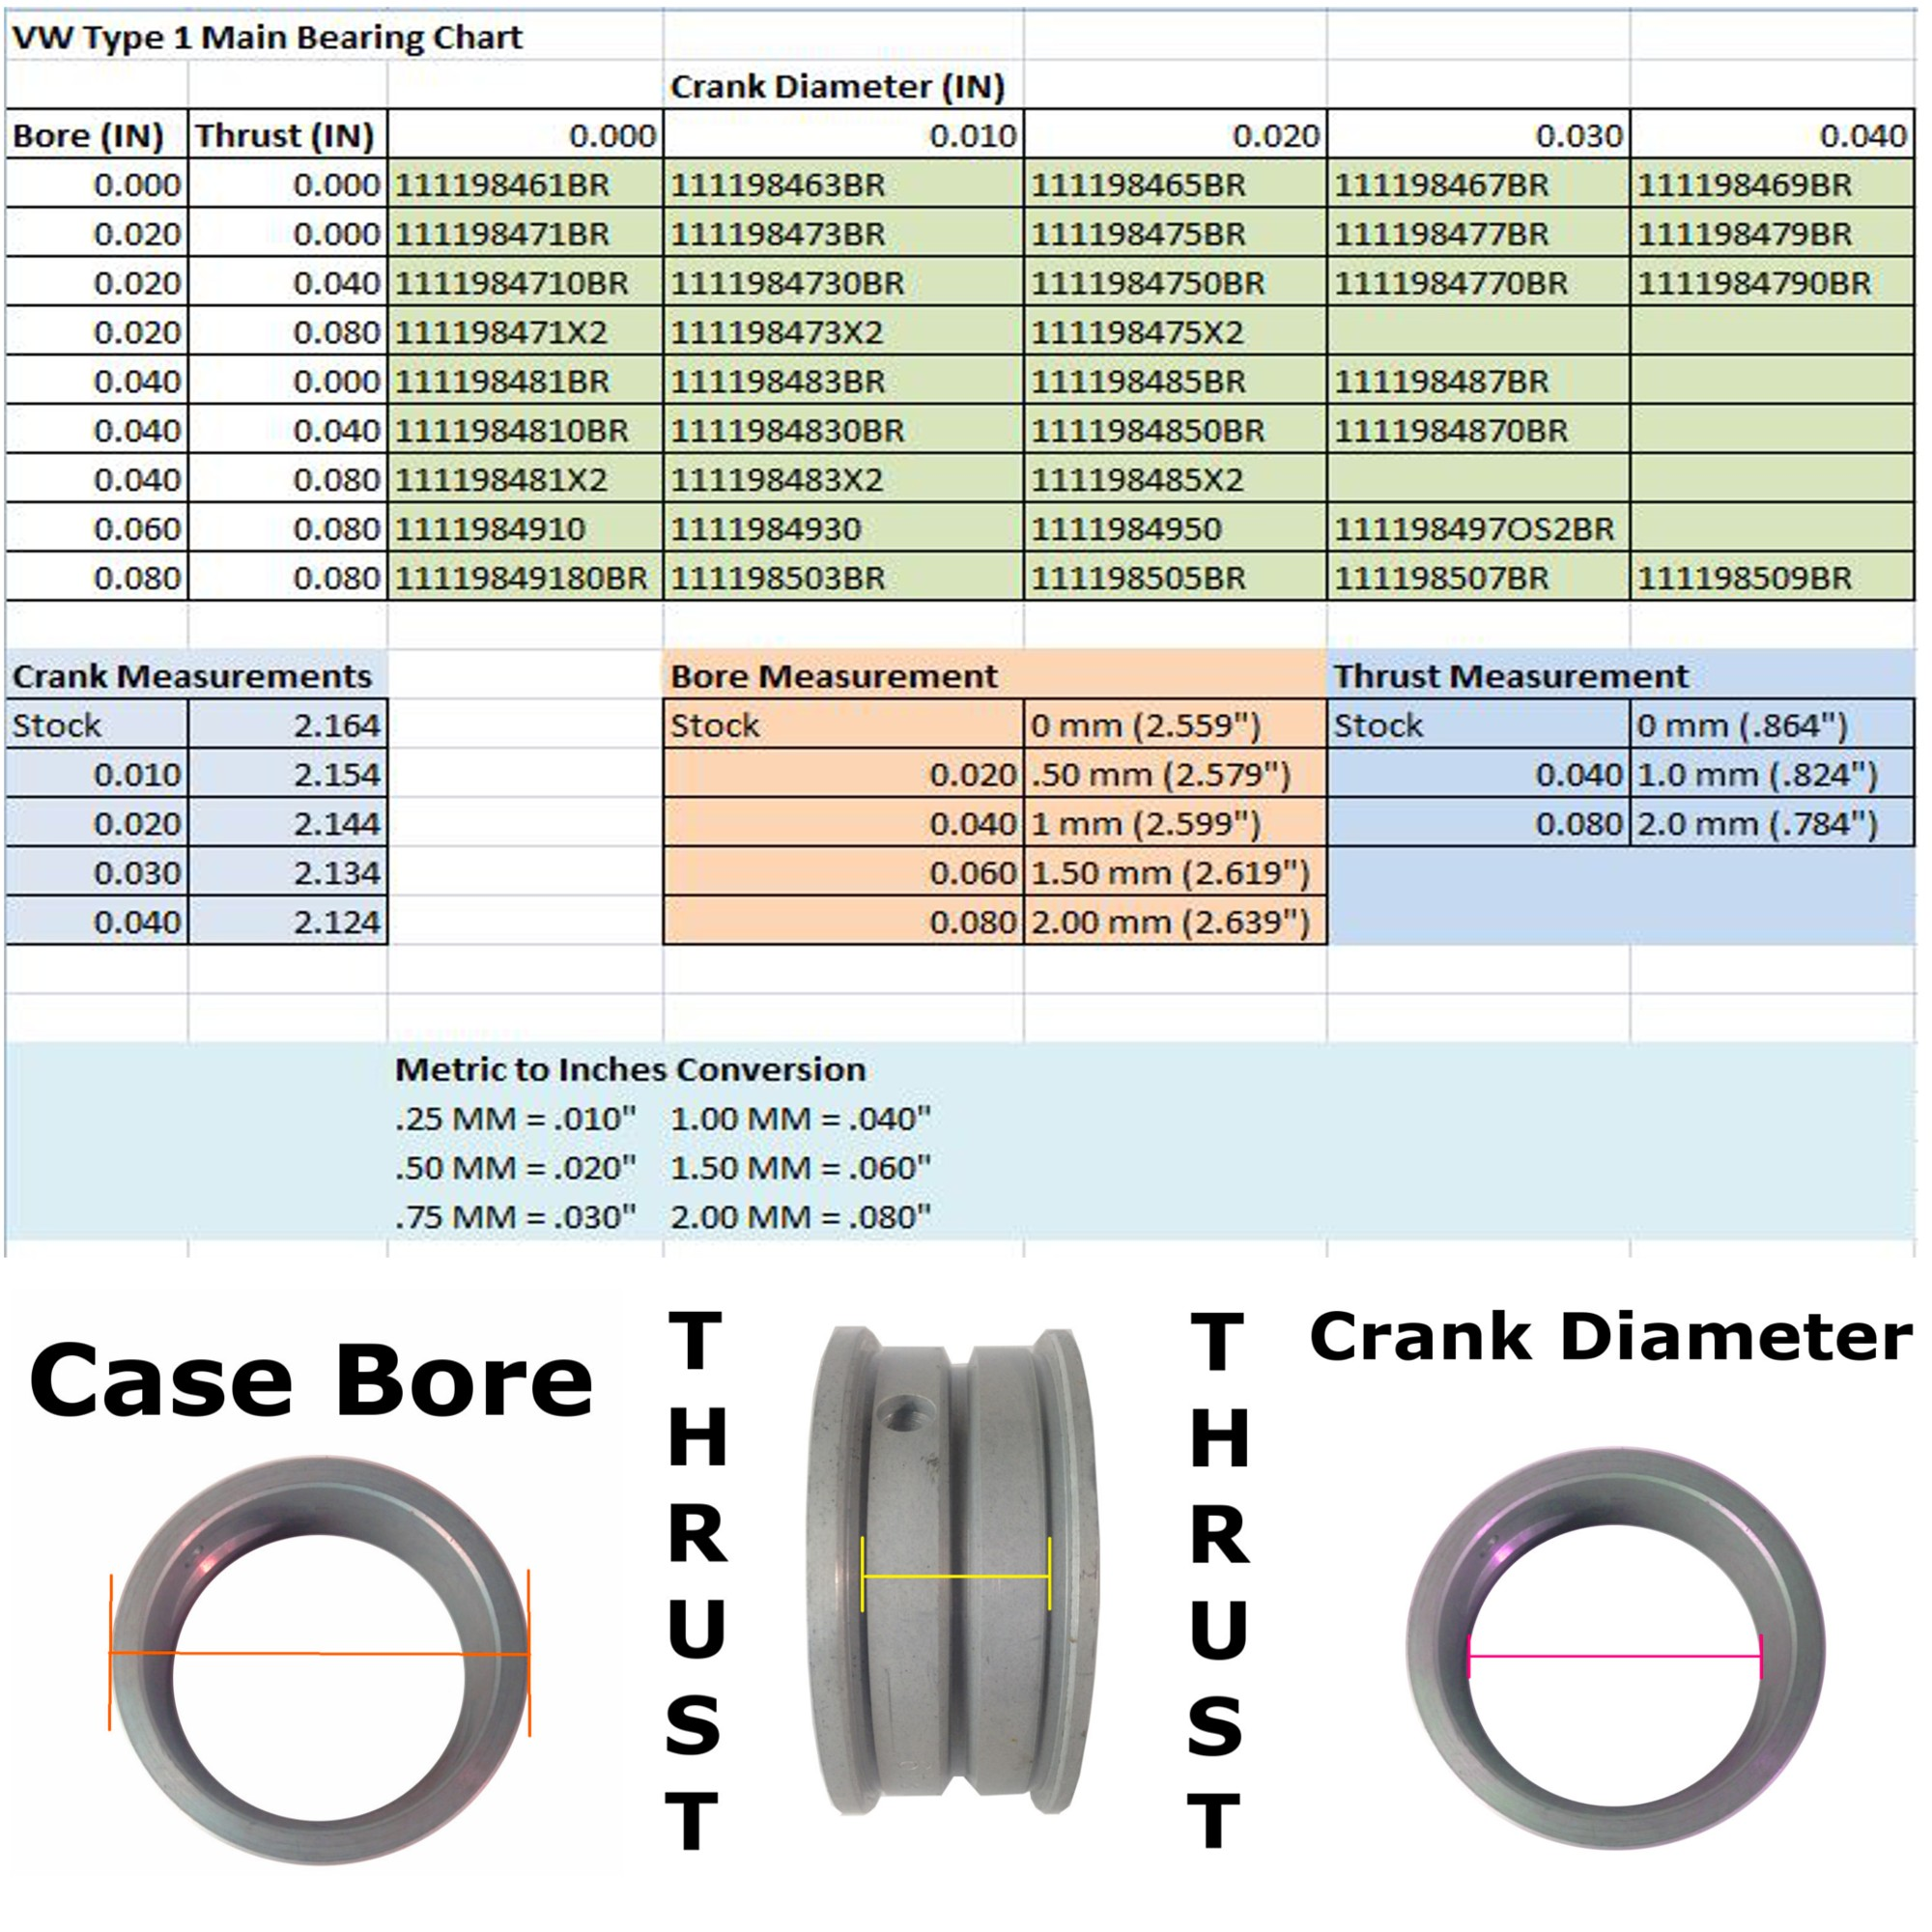 Vw Beetle Engine Diagram Vw Type 1 Main Bearing Sizing Chart for Vw Beetle & Dune Buggy Engines